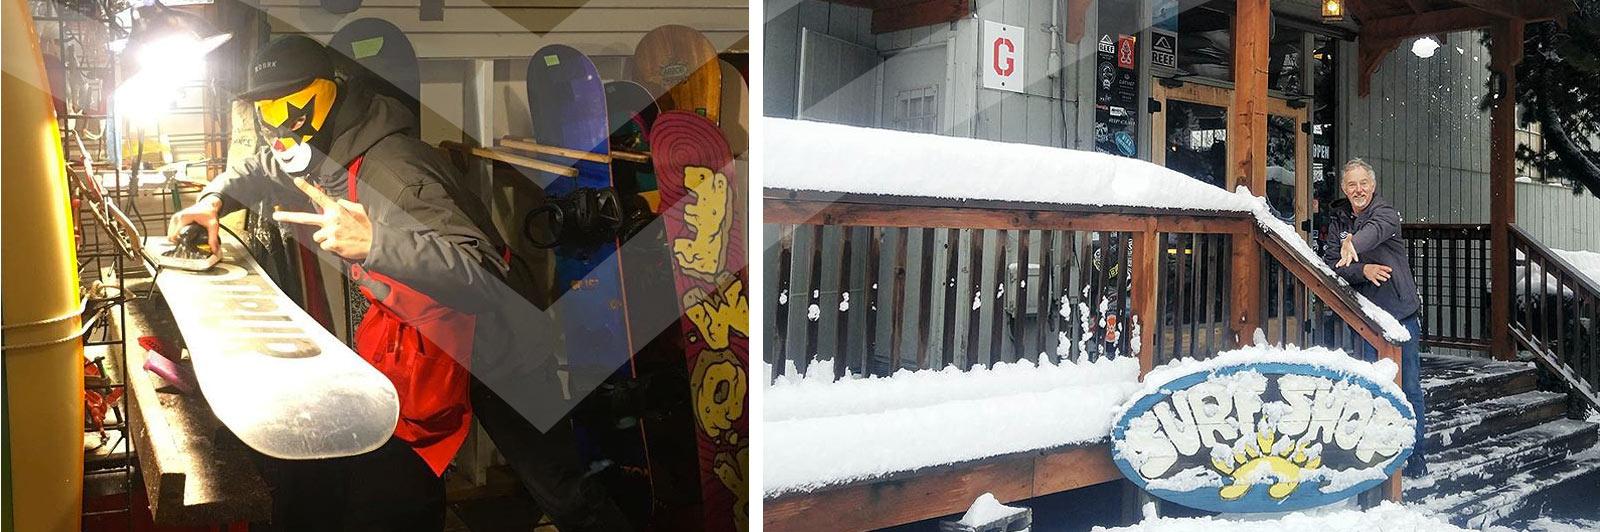 Gorge Performance Snowboard Shop